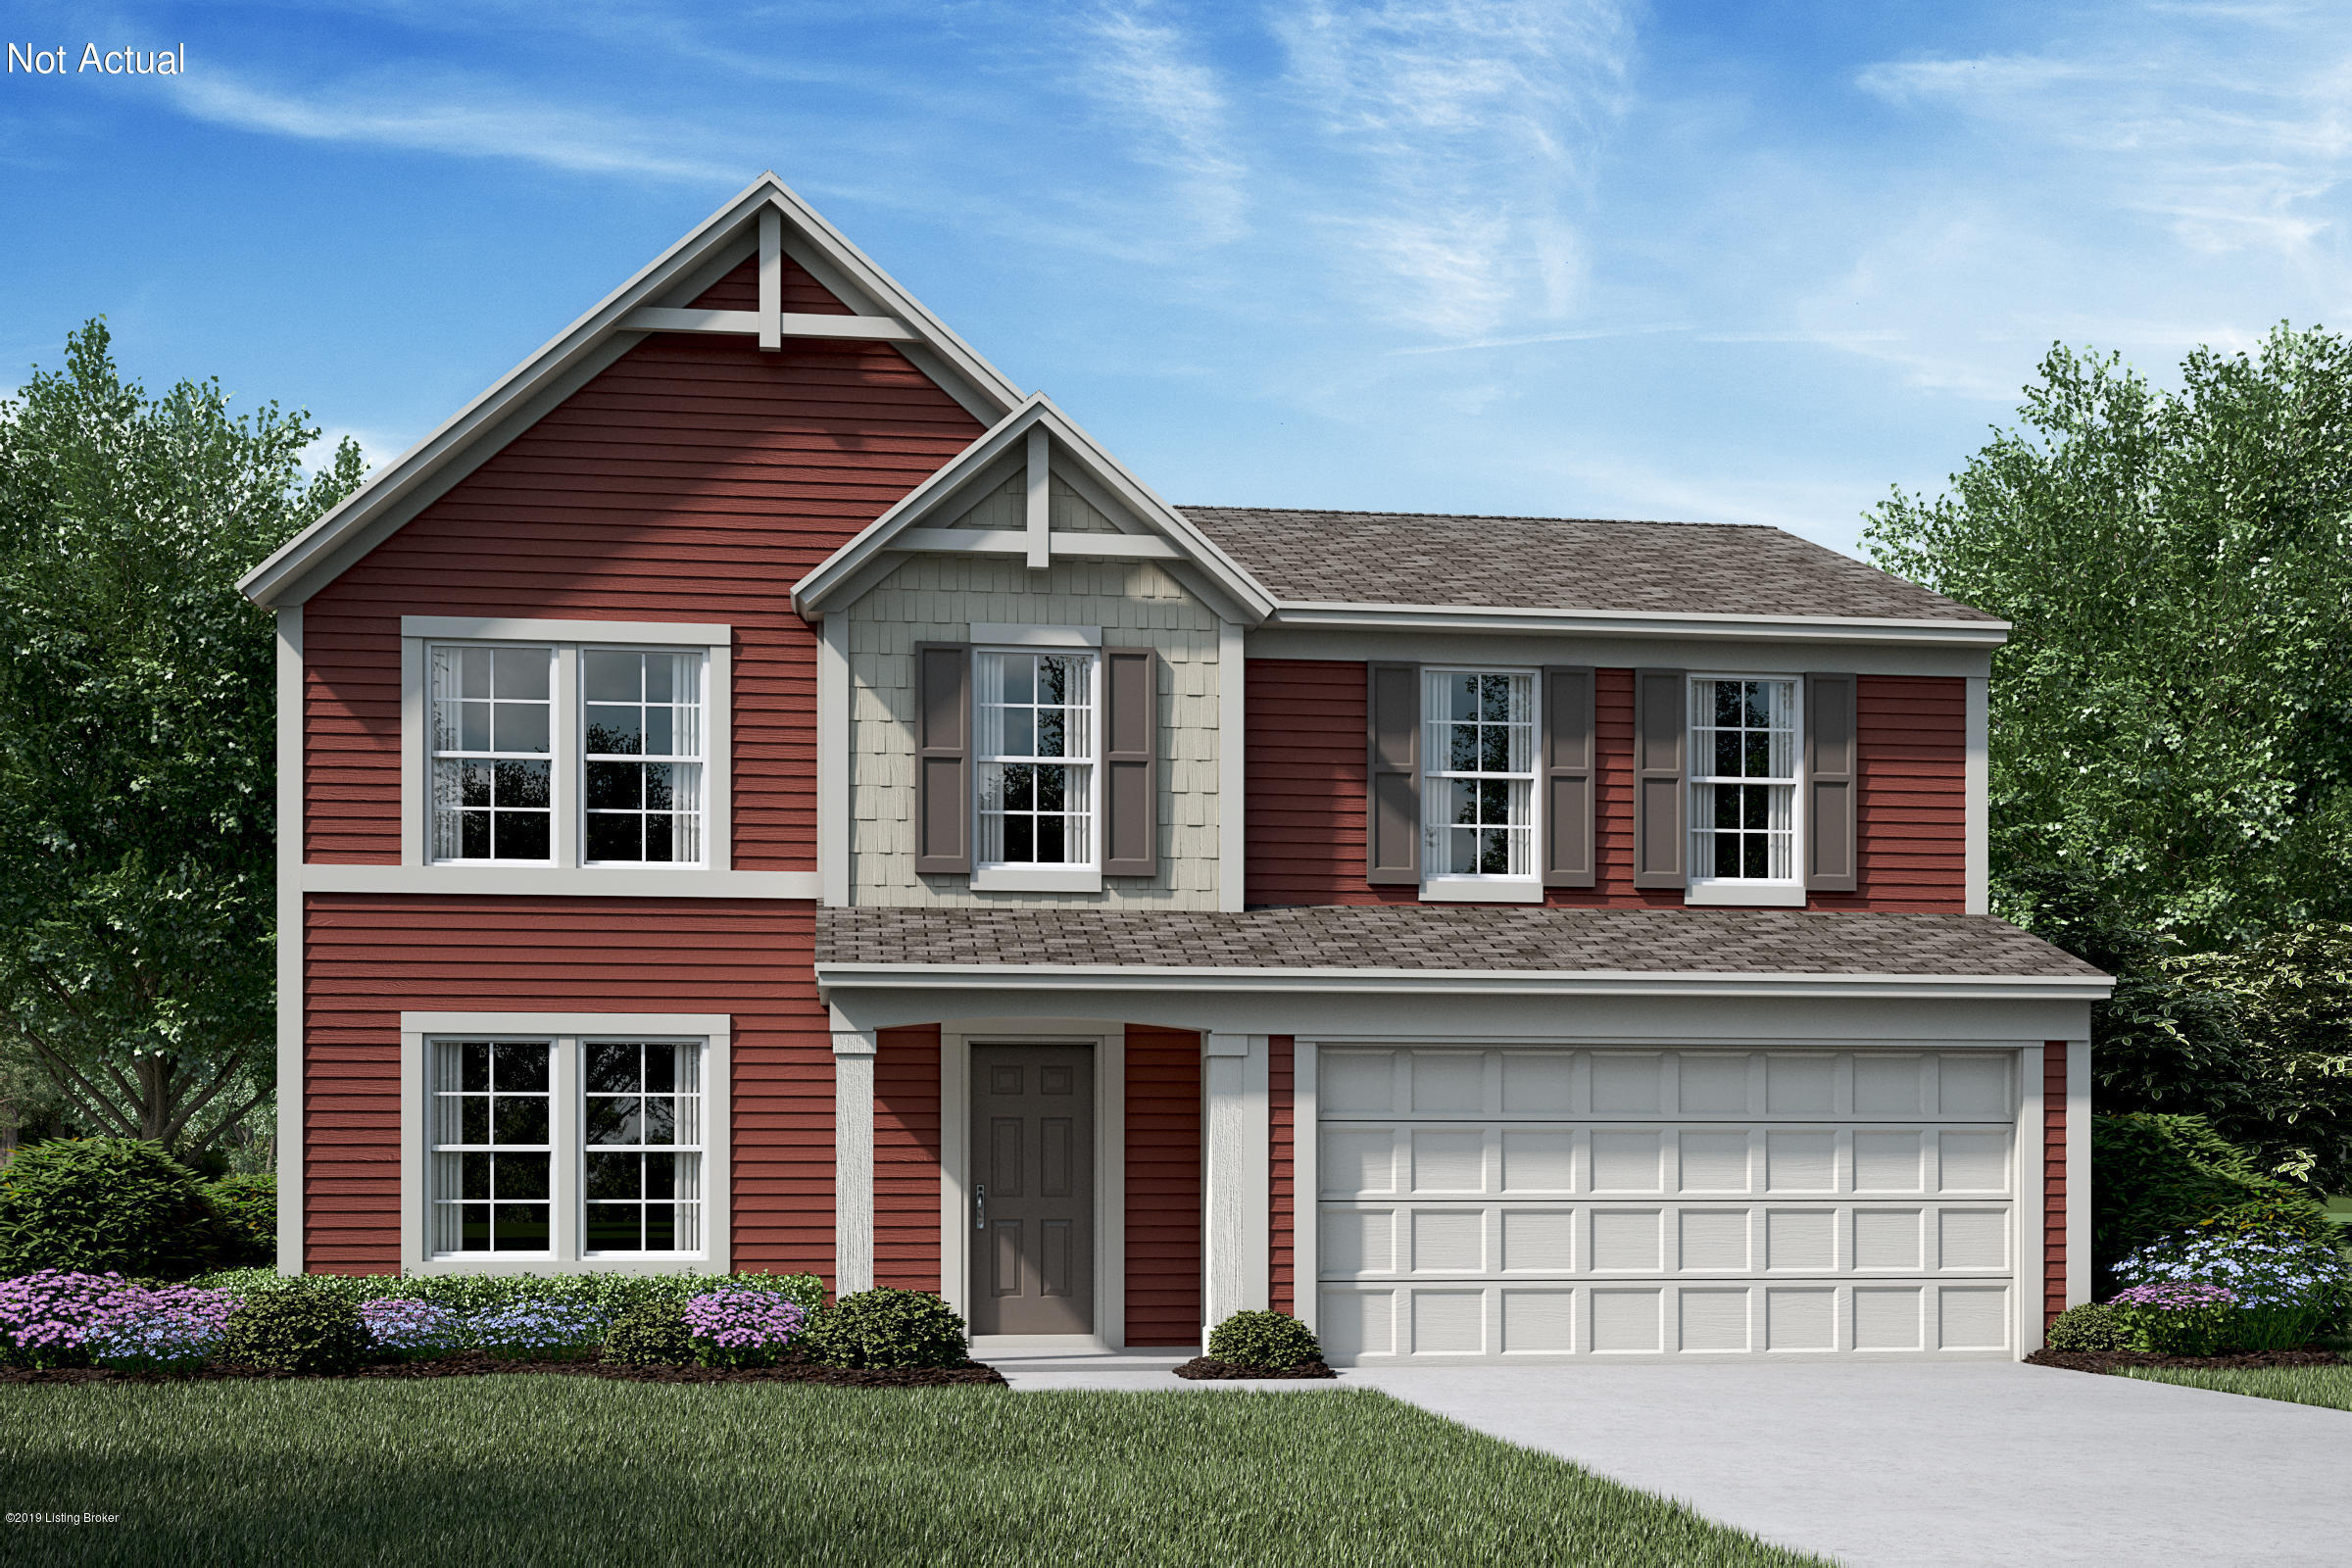 108 Eldorado Ct, Shepherdsville, Kentucky 40165, 3 Bedrooms Bedrooms, 9 Rooms Rooms,3 BathroomsBathrooms,Residential,For Sale,Eldorado,1525293